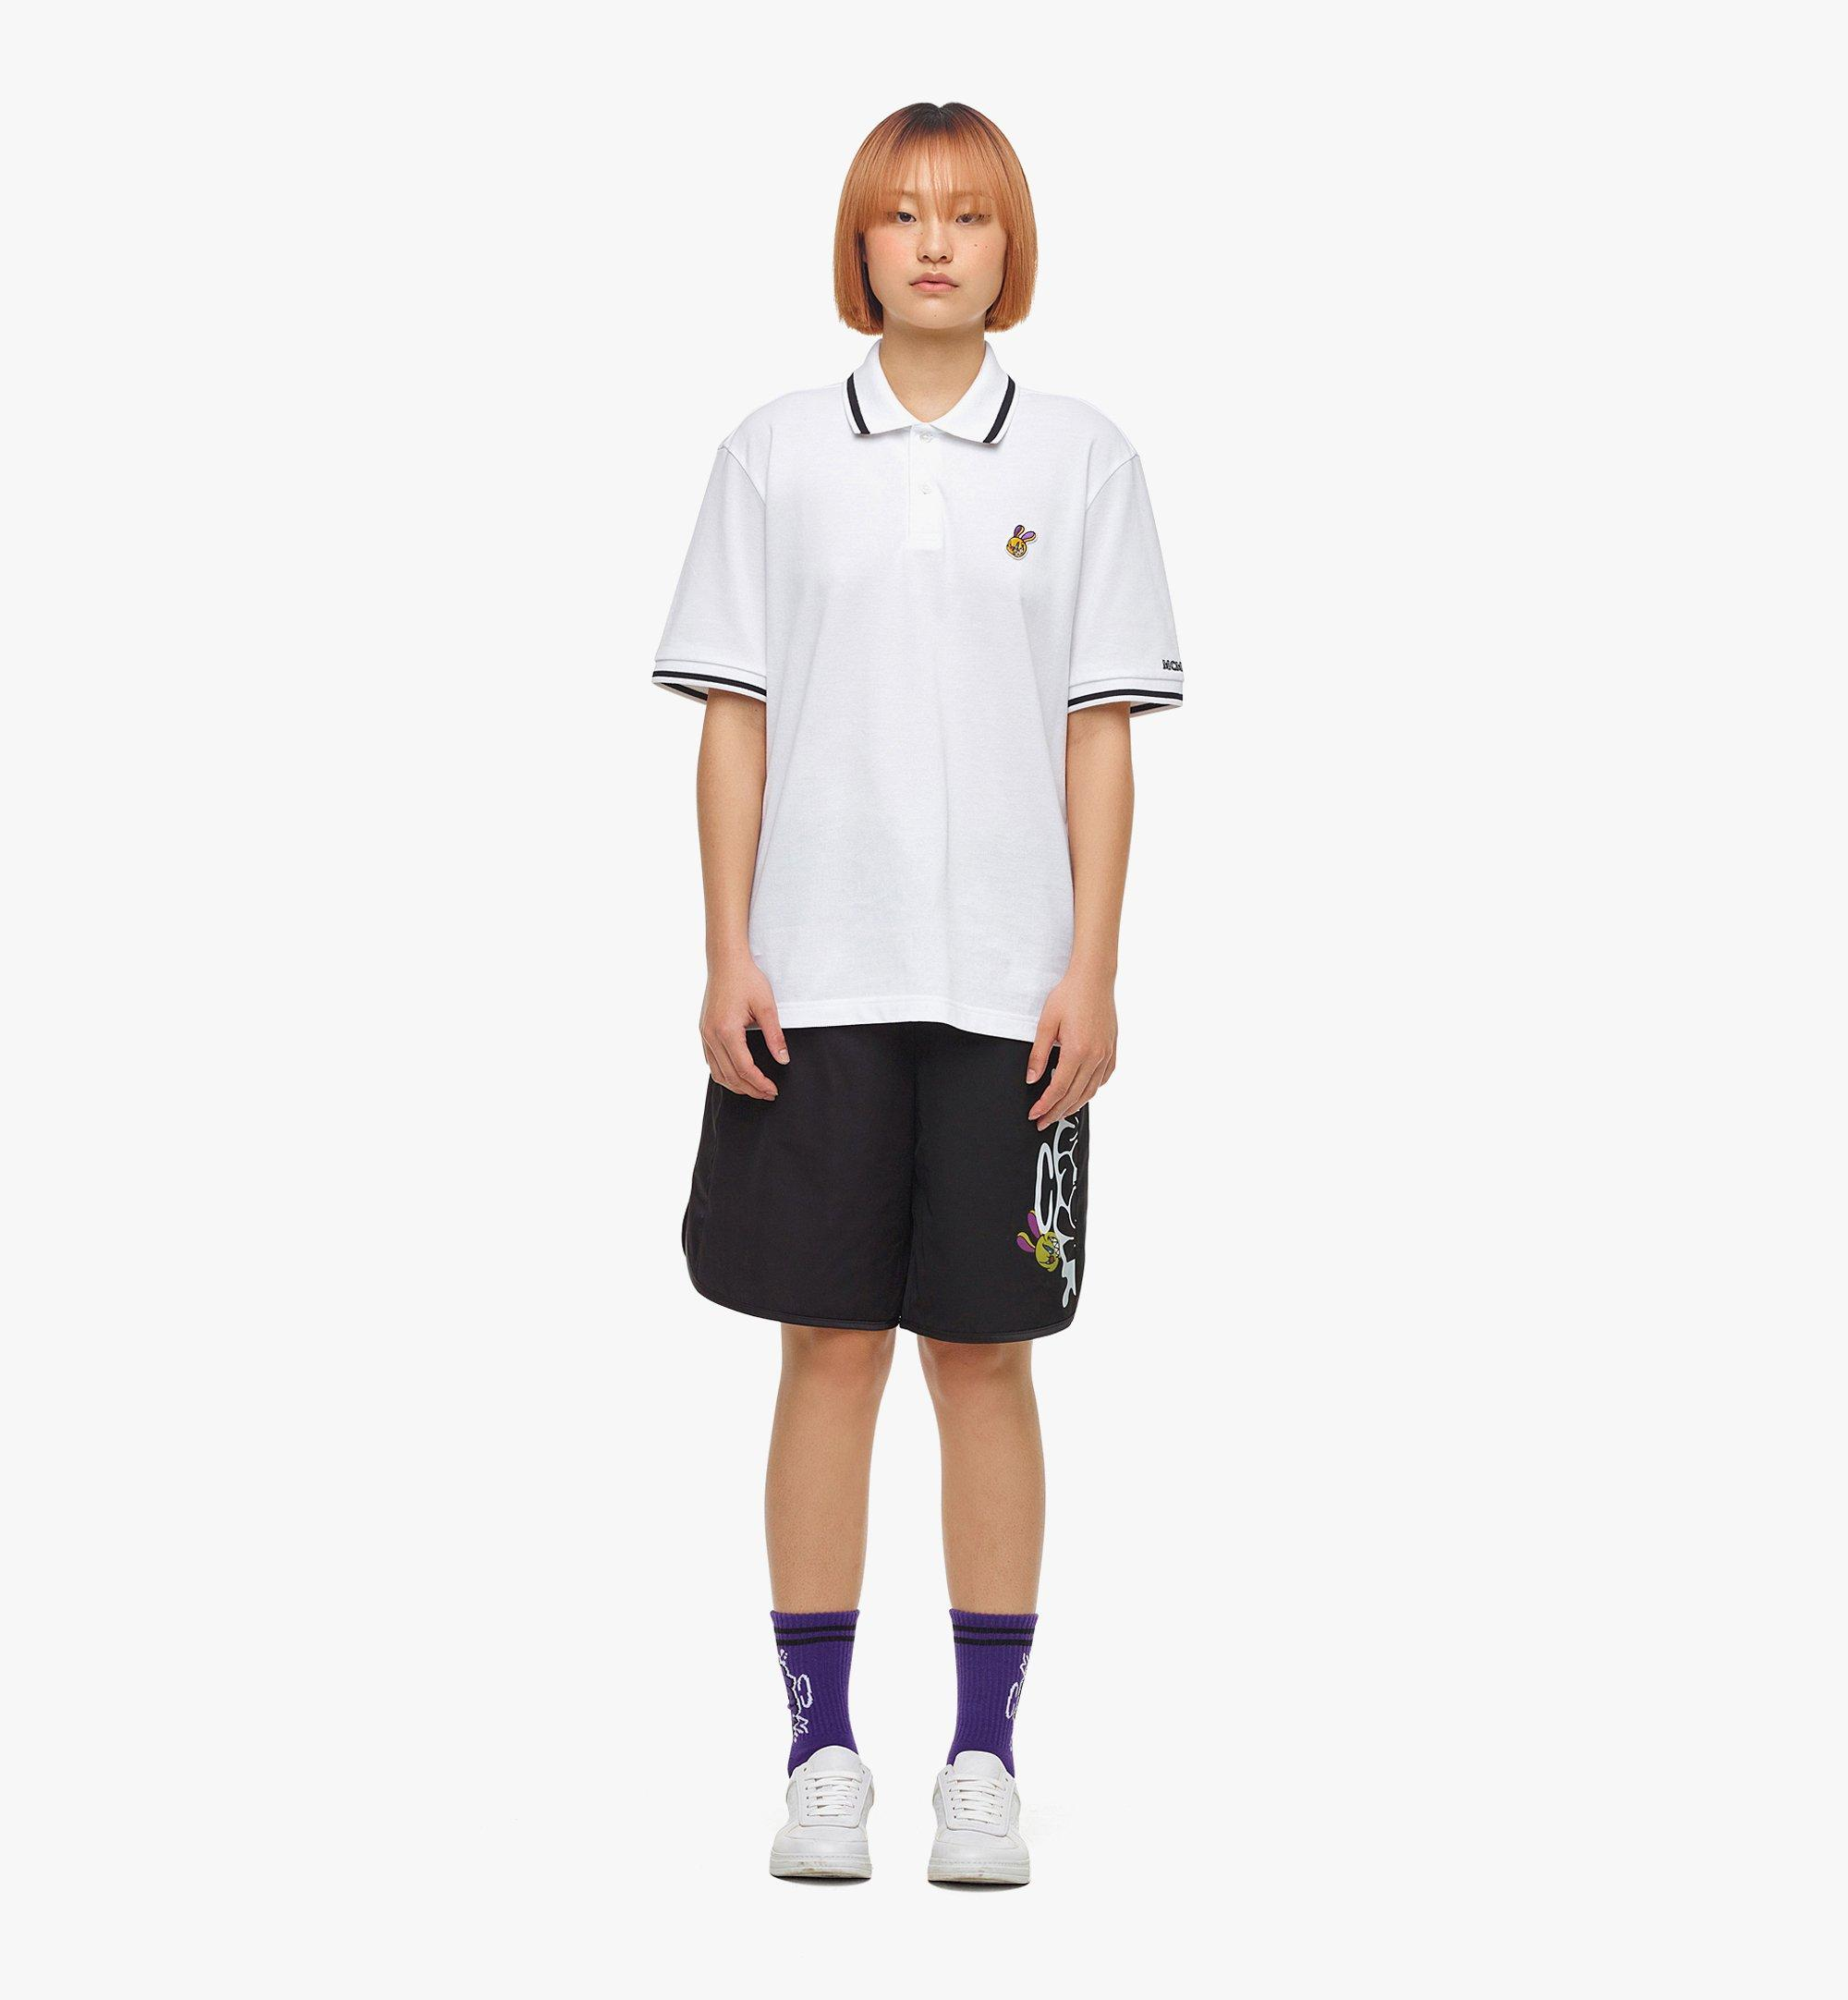 MCM เสื้อโปโล MCM x SAMBYPEN สำหรับผู้ชาย White MHTBASP01WT00L มุมมองอื่น 5